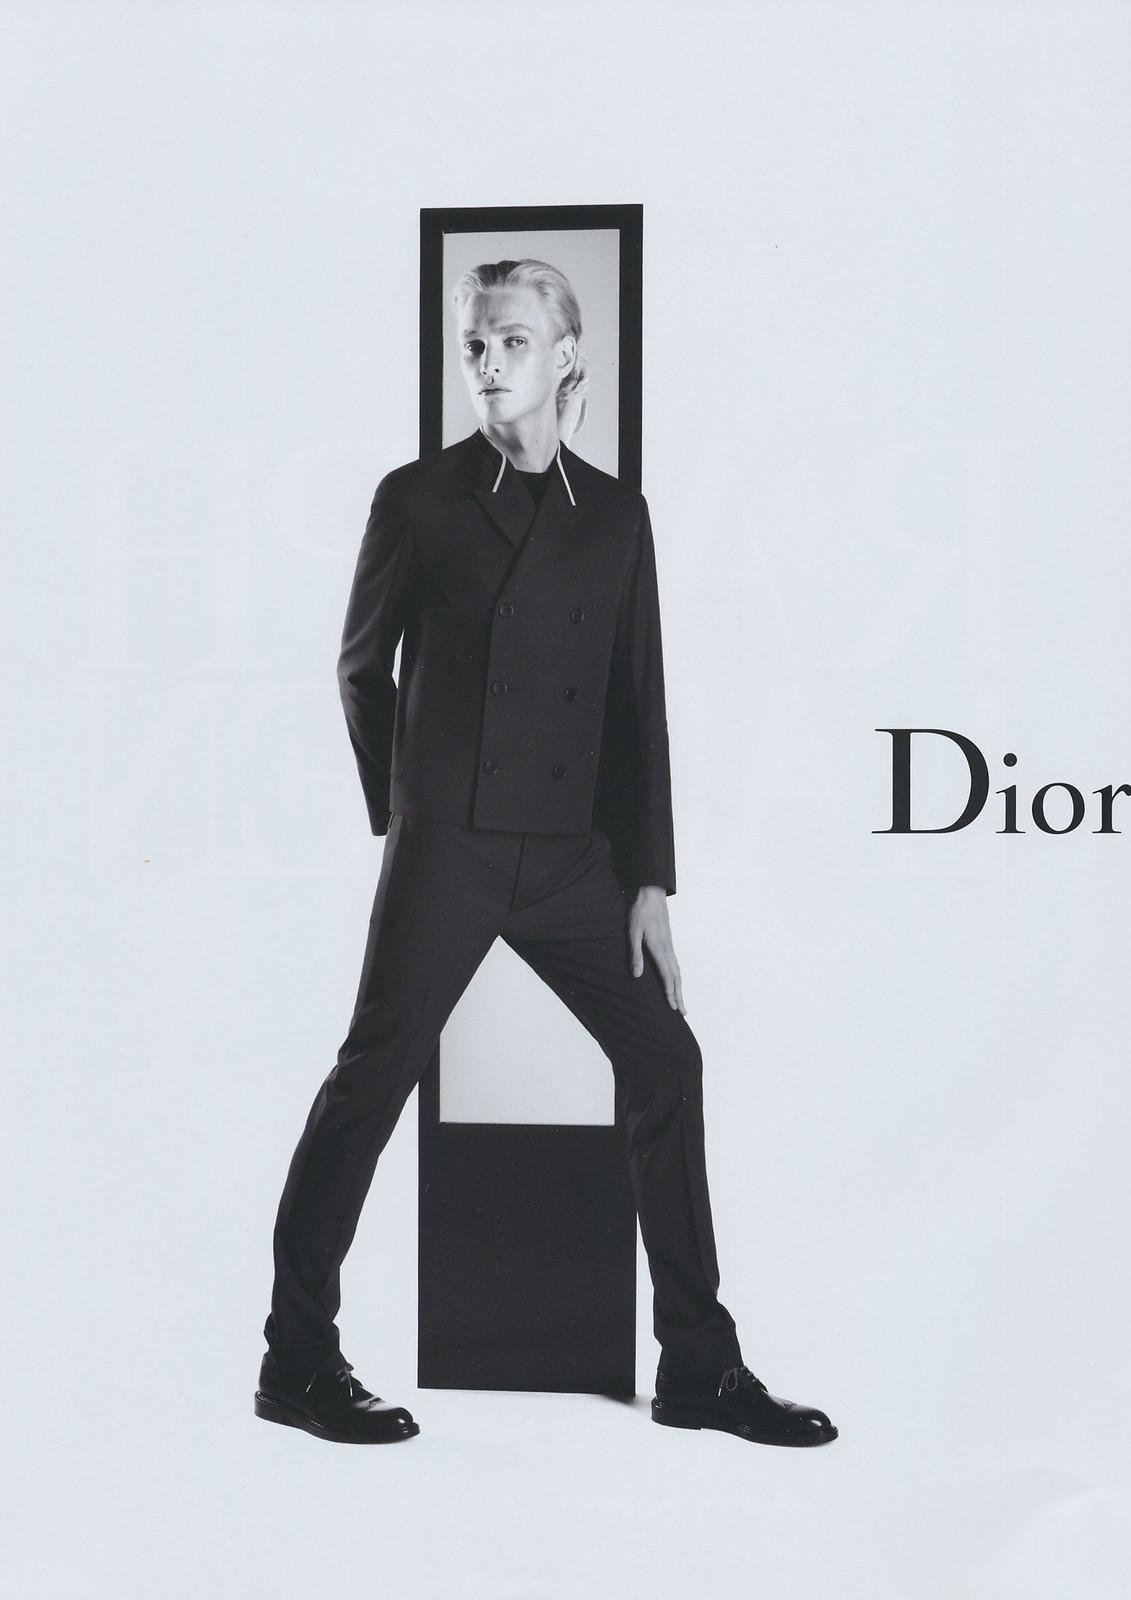 Gerhard Freidl0149_SS13 Dior Homme(MEN'S CLUB627_2013_05)